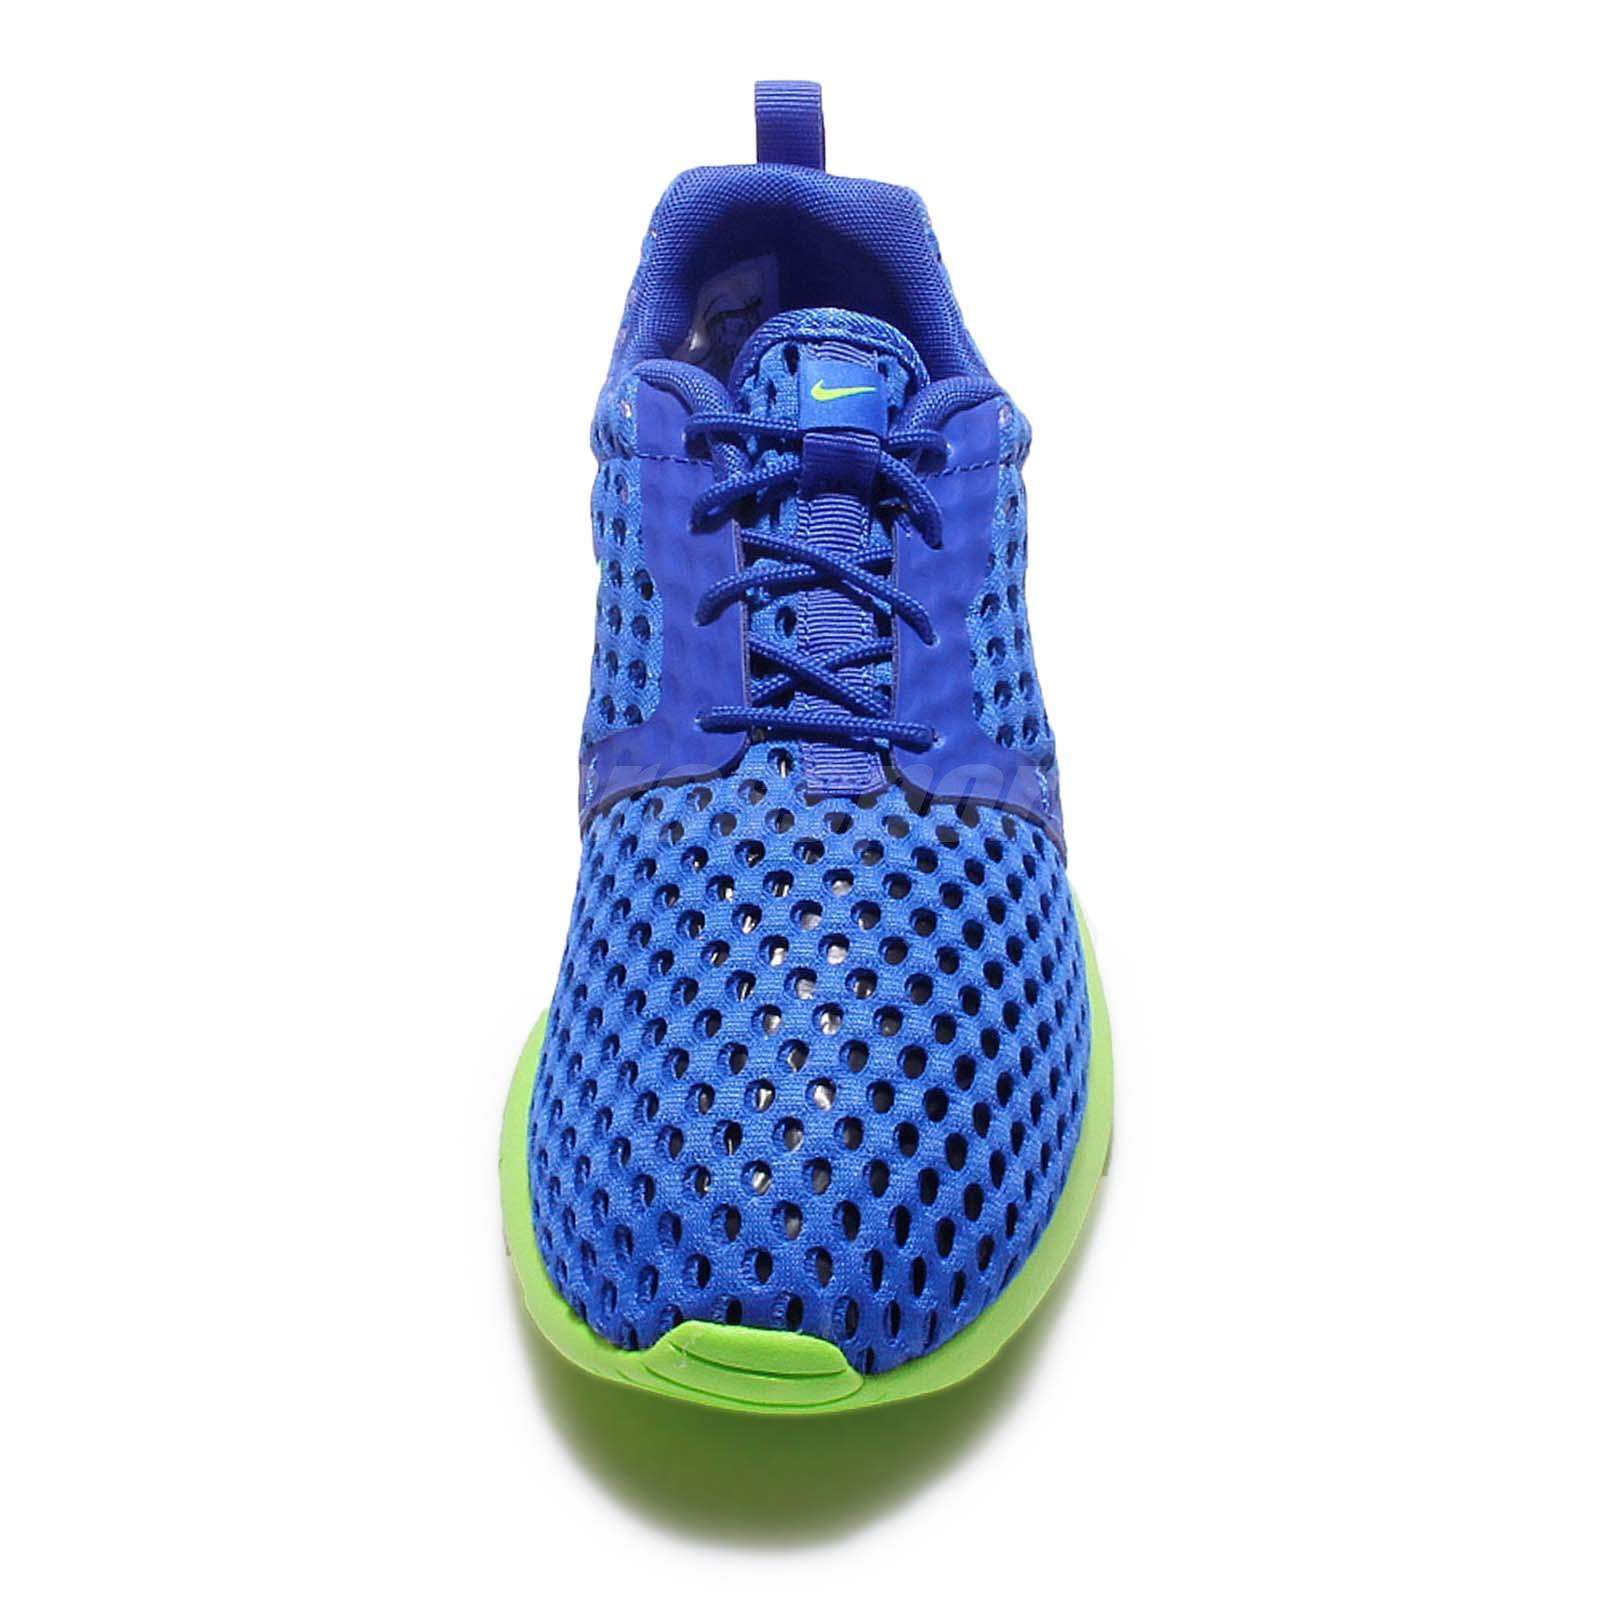 online retailer d6bda b133c Nike Roshe One Flight Weight GS Rosherun Sprite Blue Green Kid Youth ...